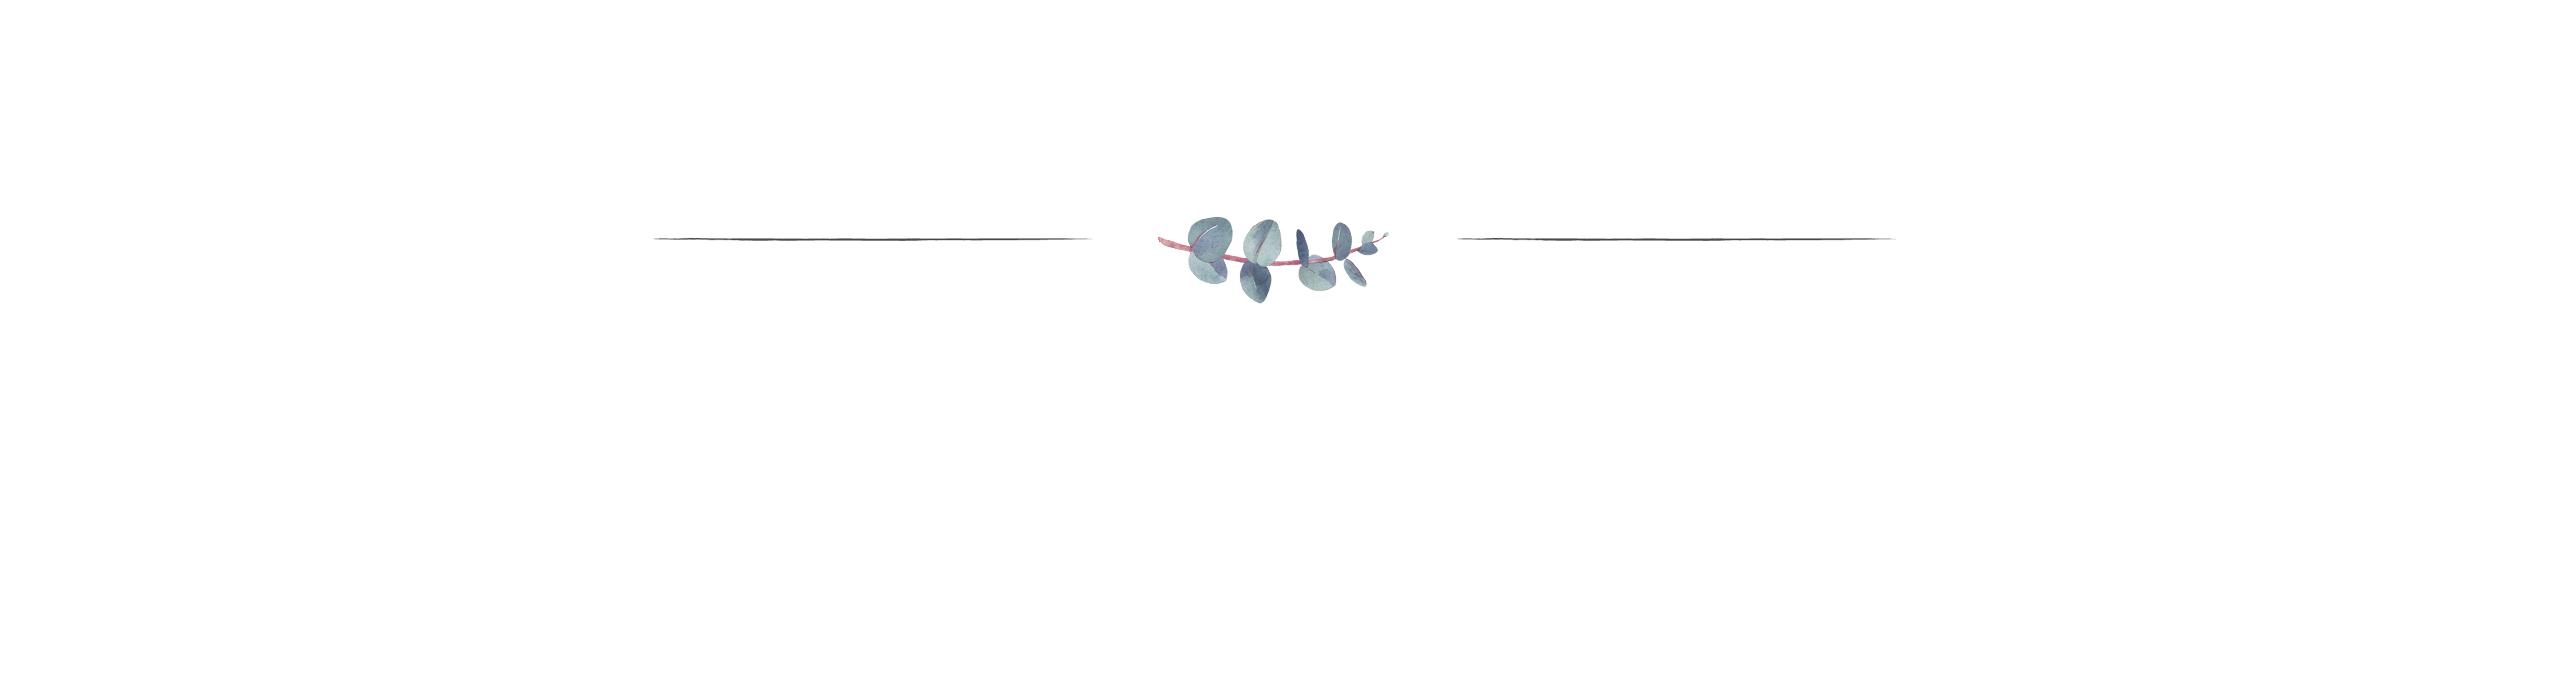 Home page - eucalyptus